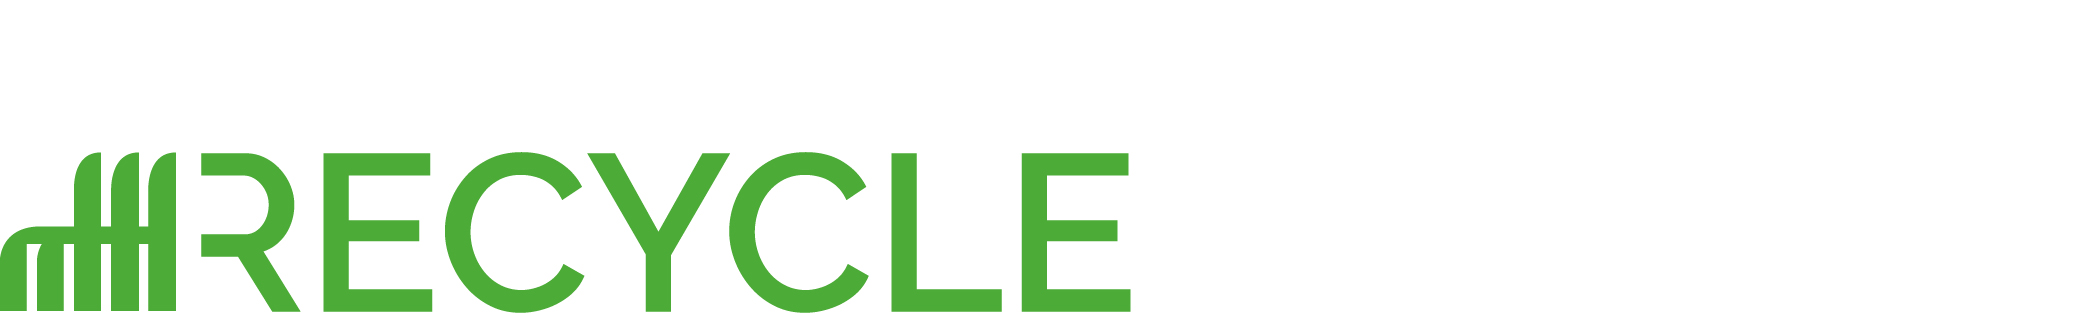 RECYCLE, impegnogreen, greenpledge